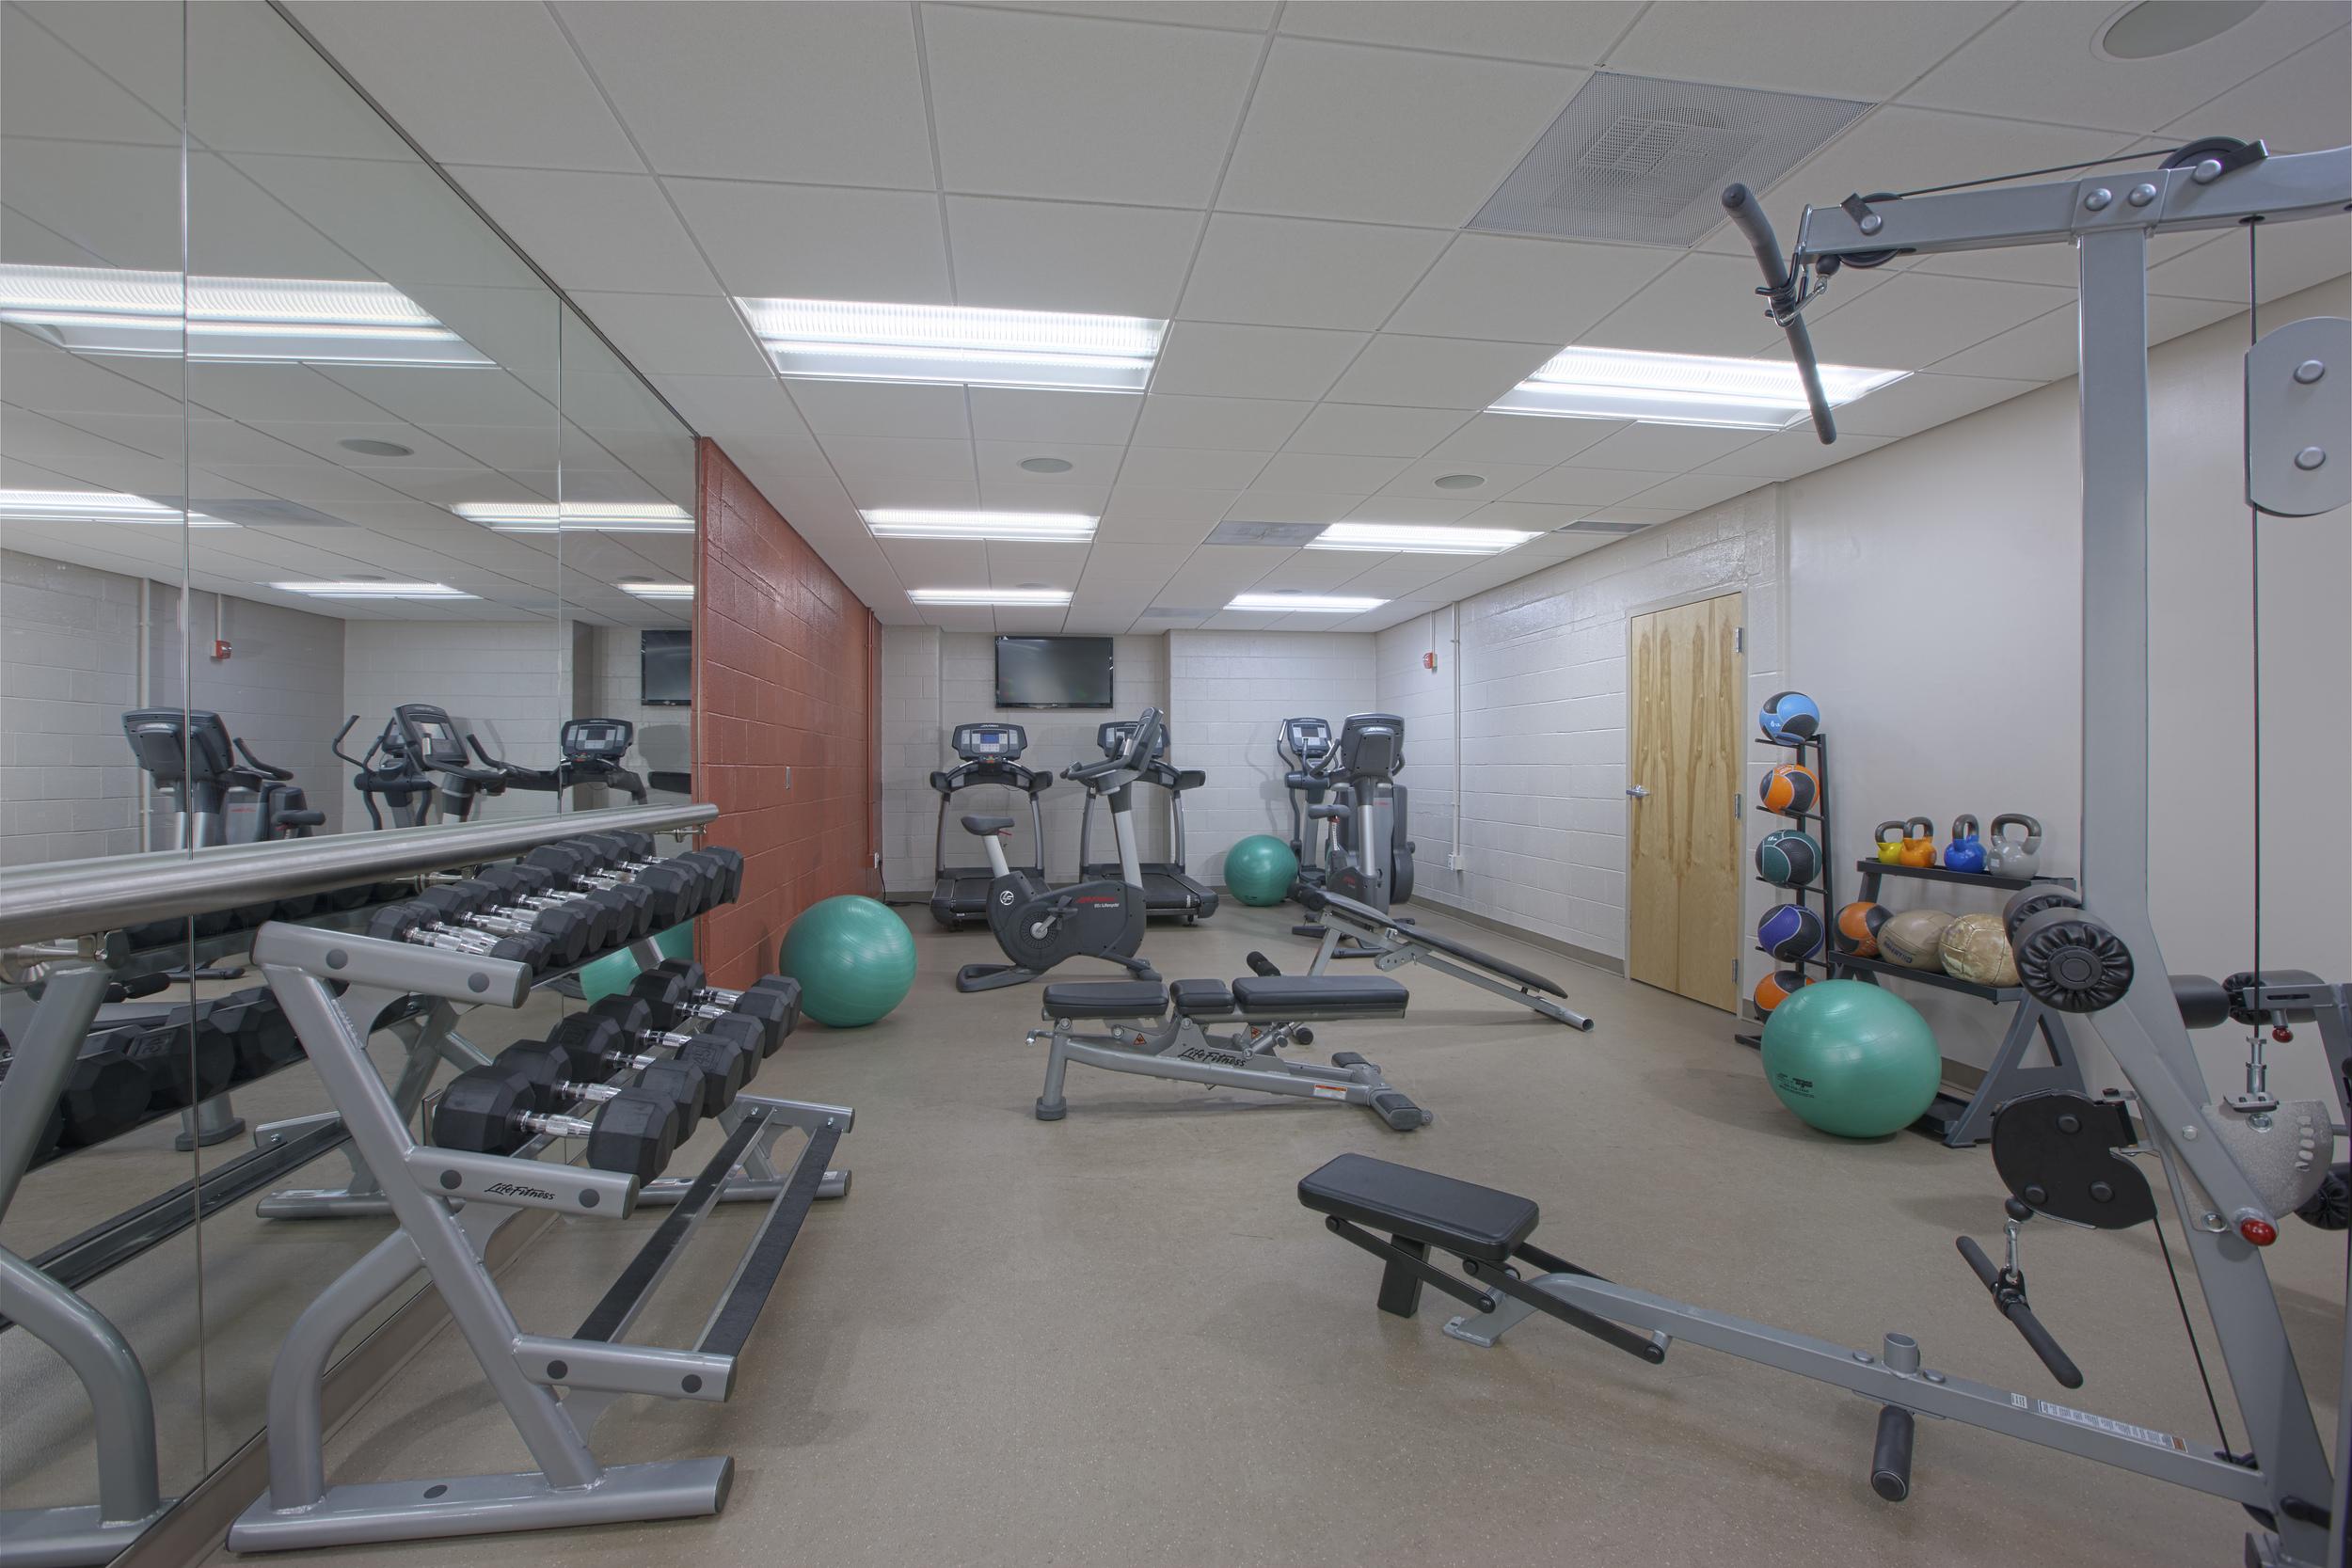 Bald Eagle Rec Center Interior Image-145460.jpg